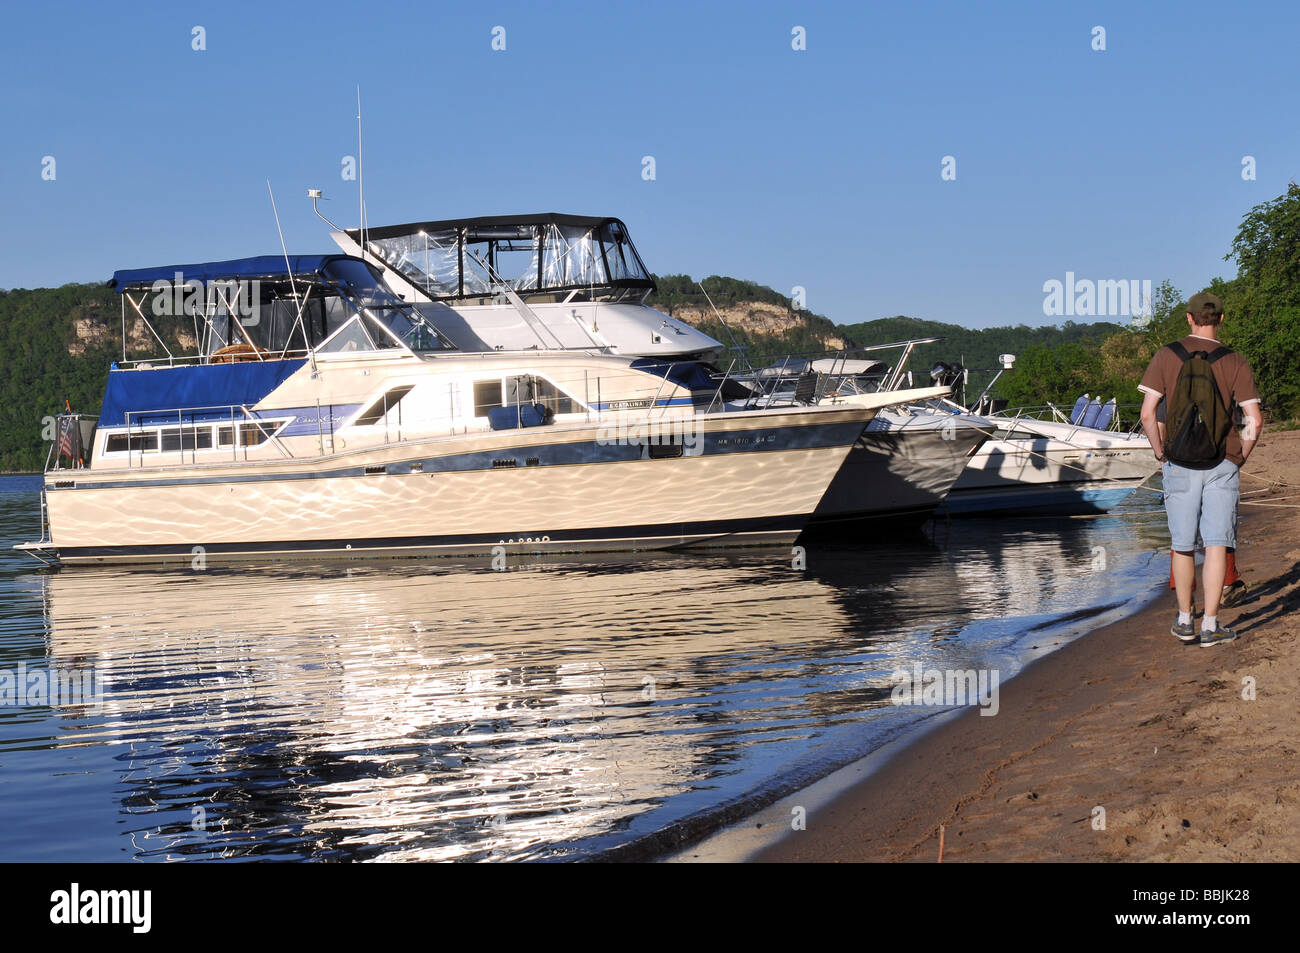 Anchored boats. - Stock Image